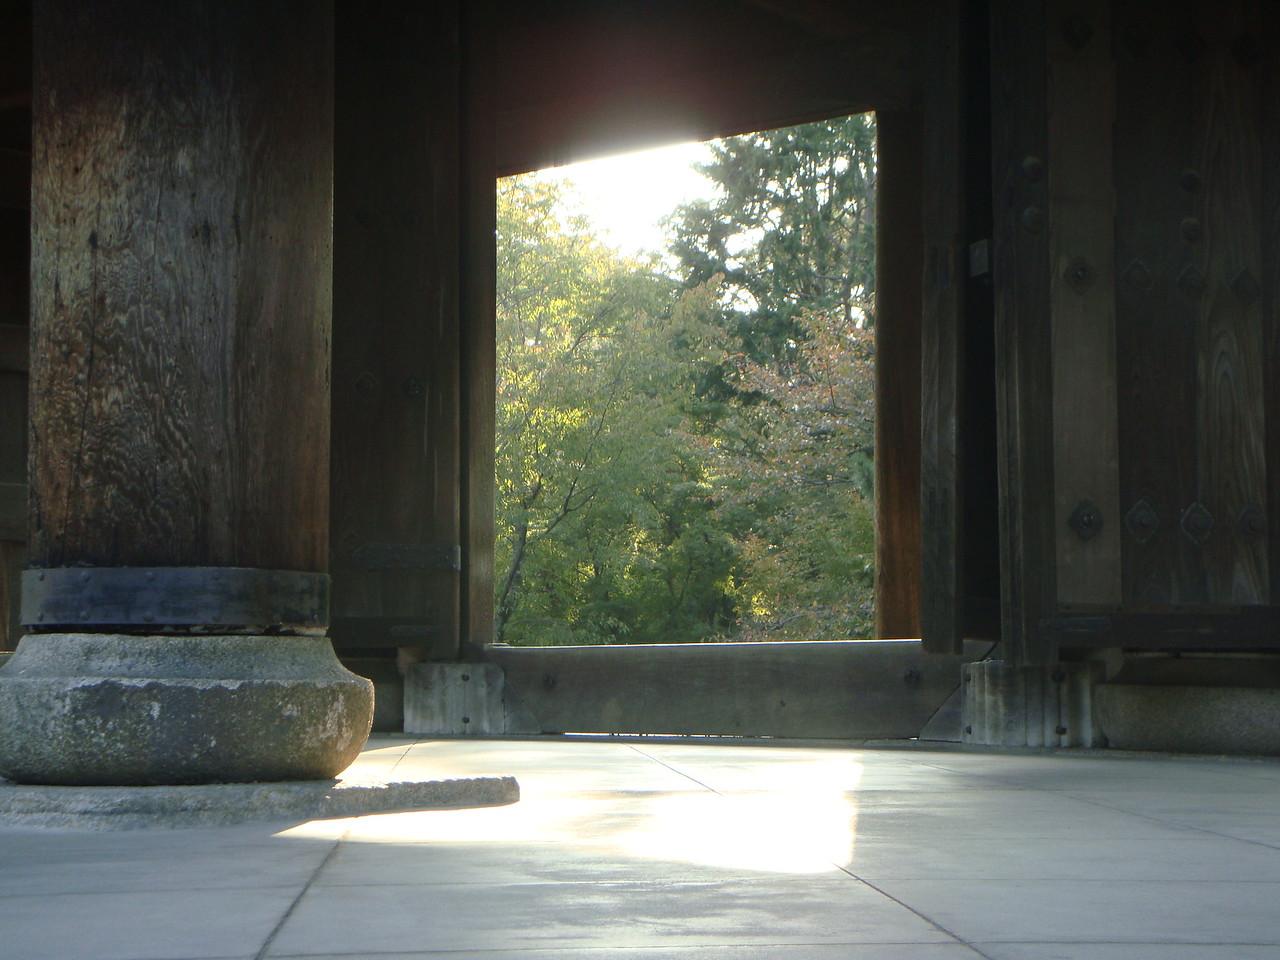 THE GATE TO NANZENJI TEMPLE IN KYOTO